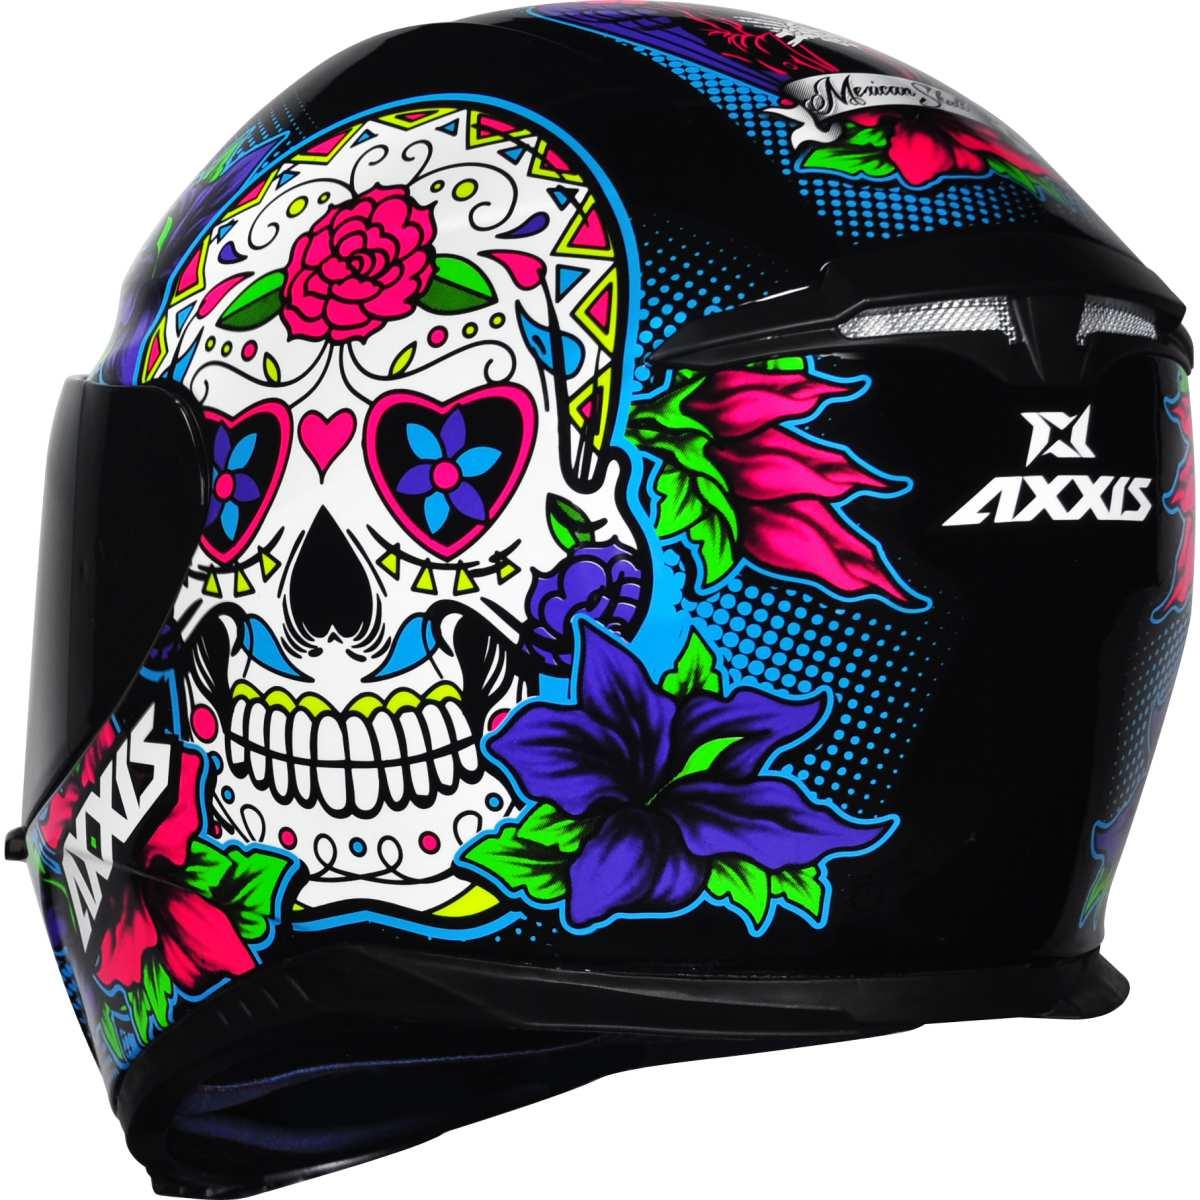 CAPACETE MOTO AXXIS EAGLE SKULL CAVEIRA MEXICANA PRETO AZUL BRILHANTE Nº 60 + BALACLAVA TOUCA NINJA